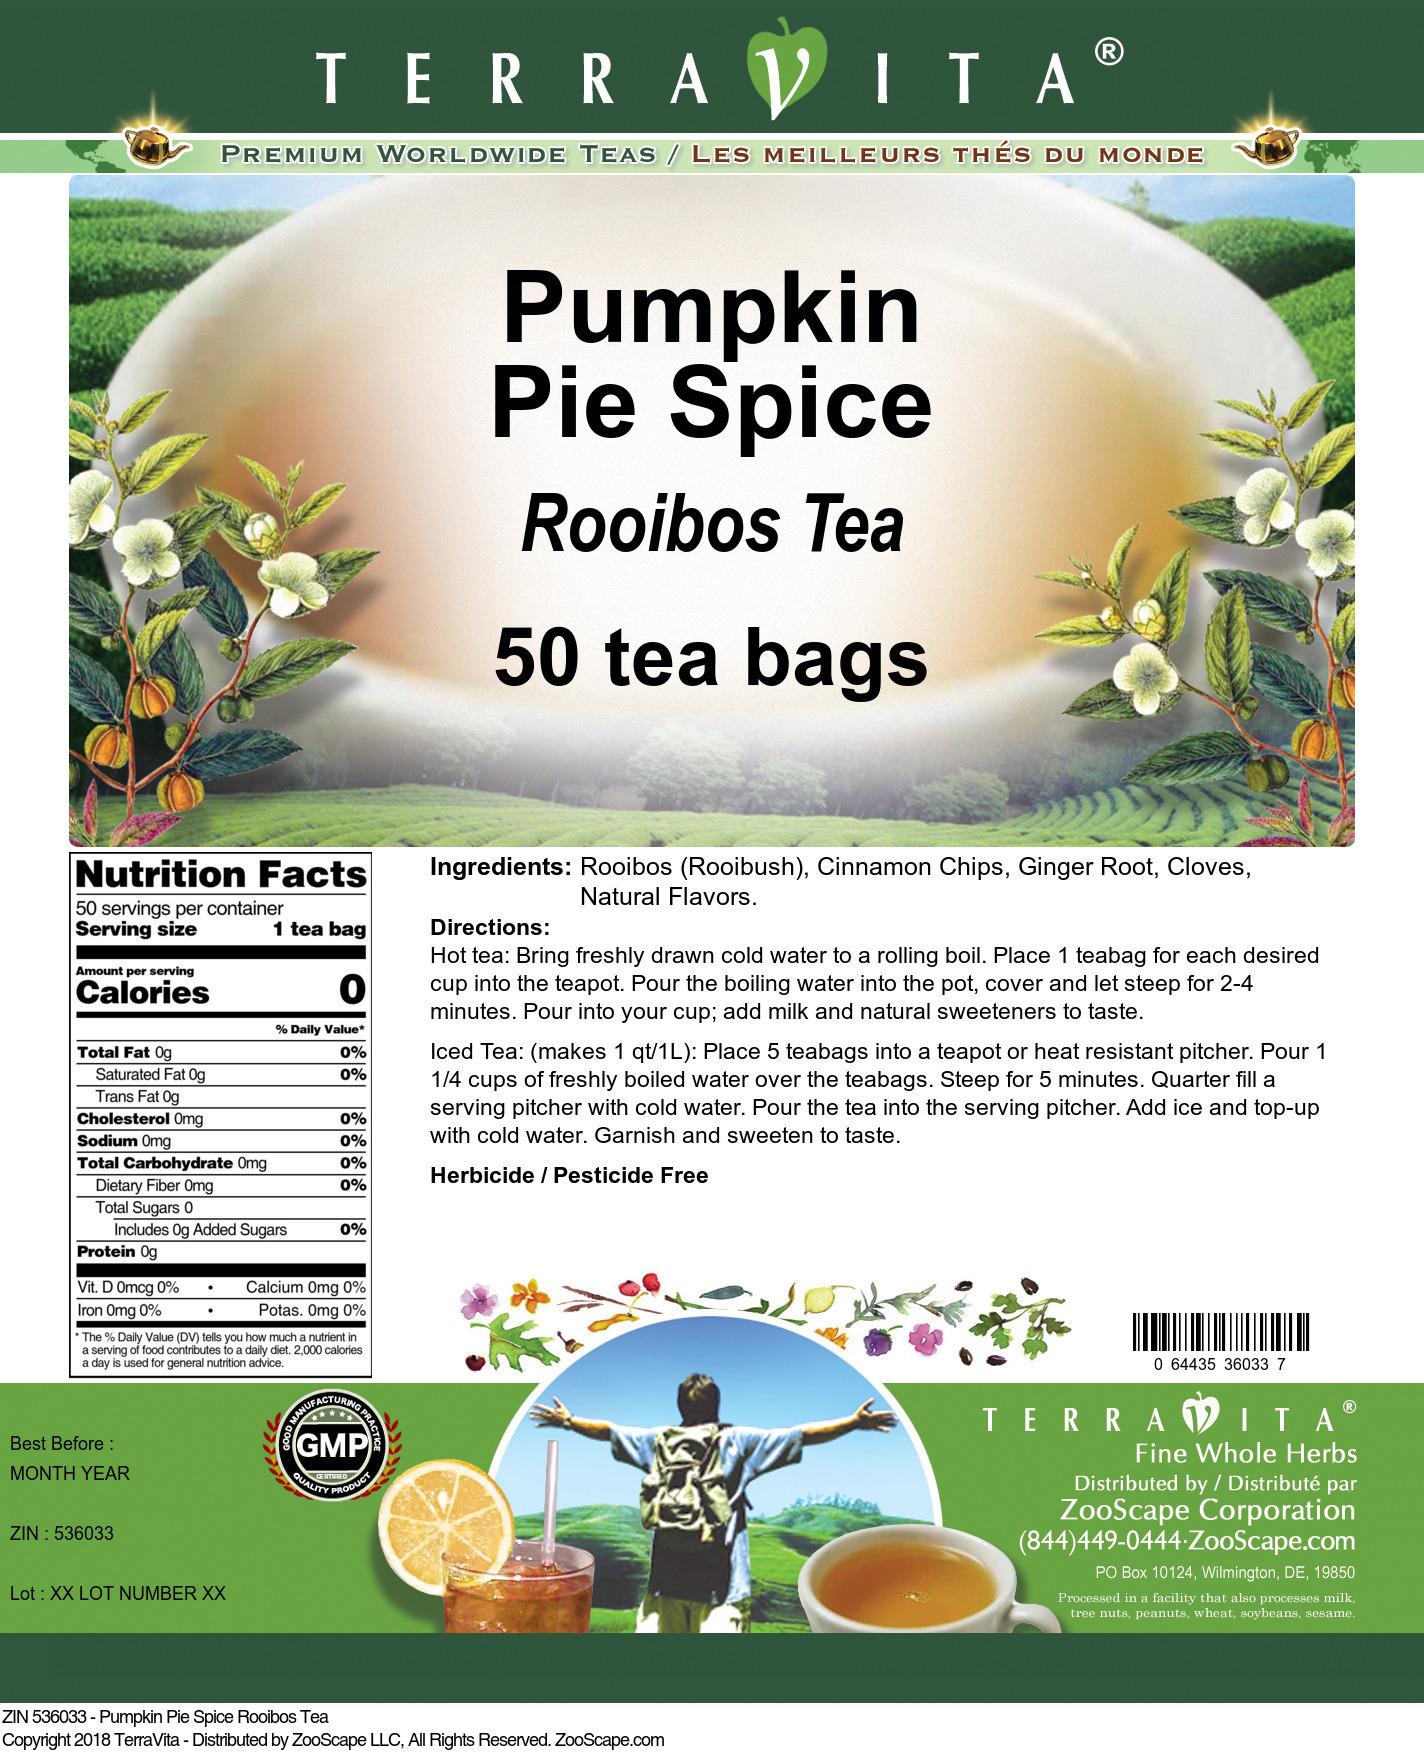 Pumpkin Pie Spice Rooibos Tea